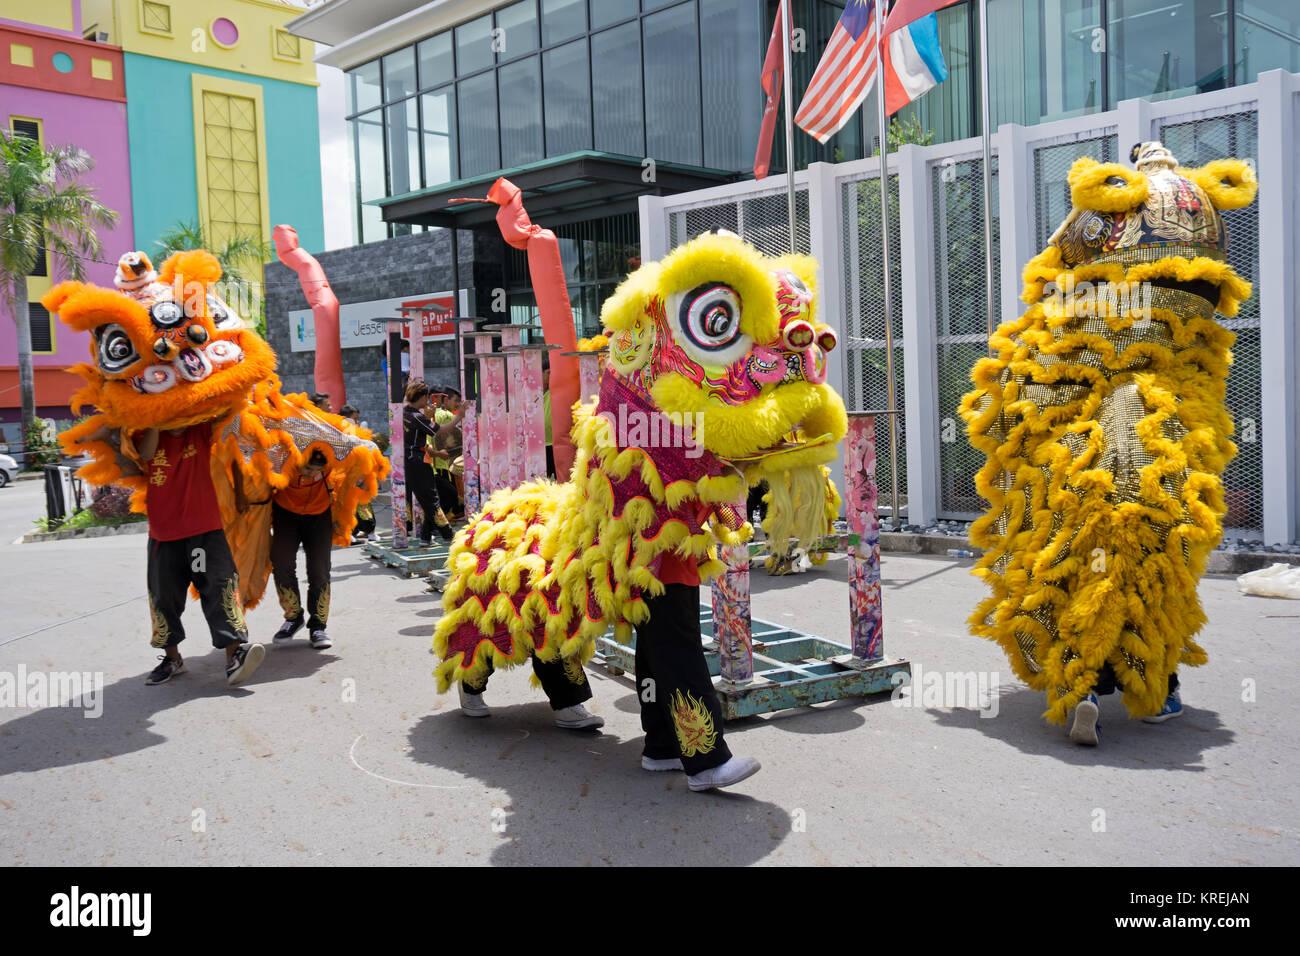 Kota Kinabalu, Malaysia - February 18, 2017: Dragon dance performance during Chinese new Year season in Sabah Borneo. - Stock Image